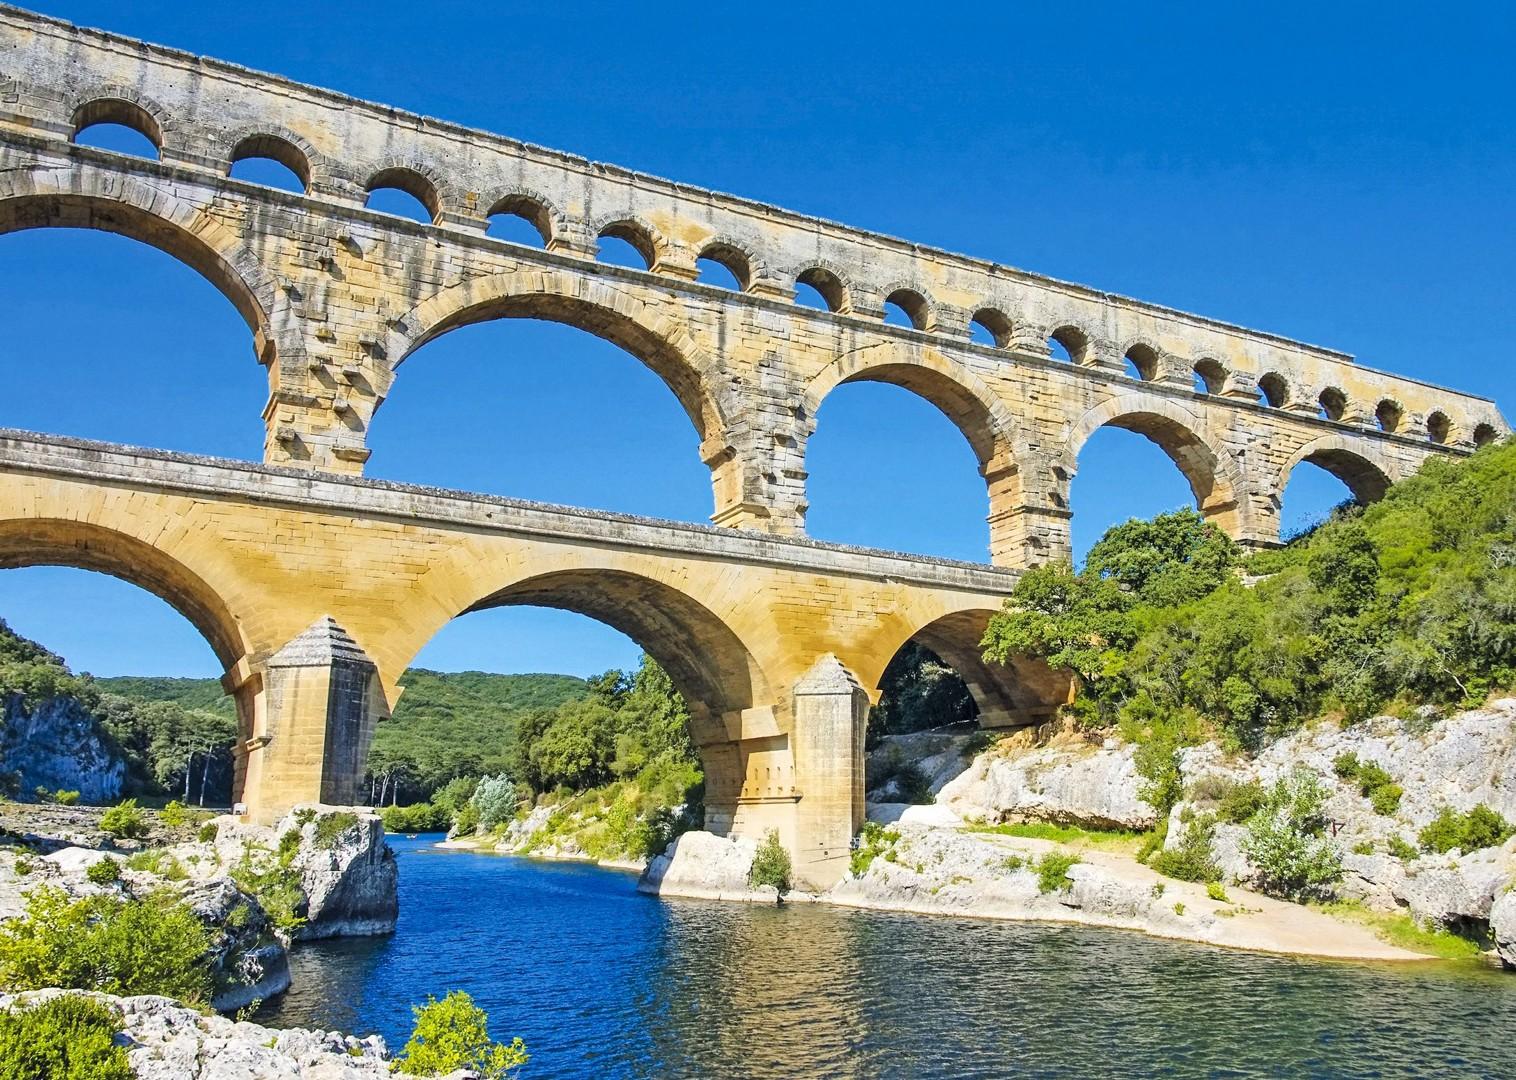 pont-du-gard-gardon-river-cycling-boat-cruise-holiday.jpg - France - Provence - Avignon to Aigues-Mortes - Bike and Barge Holiday - Leisure Cycling